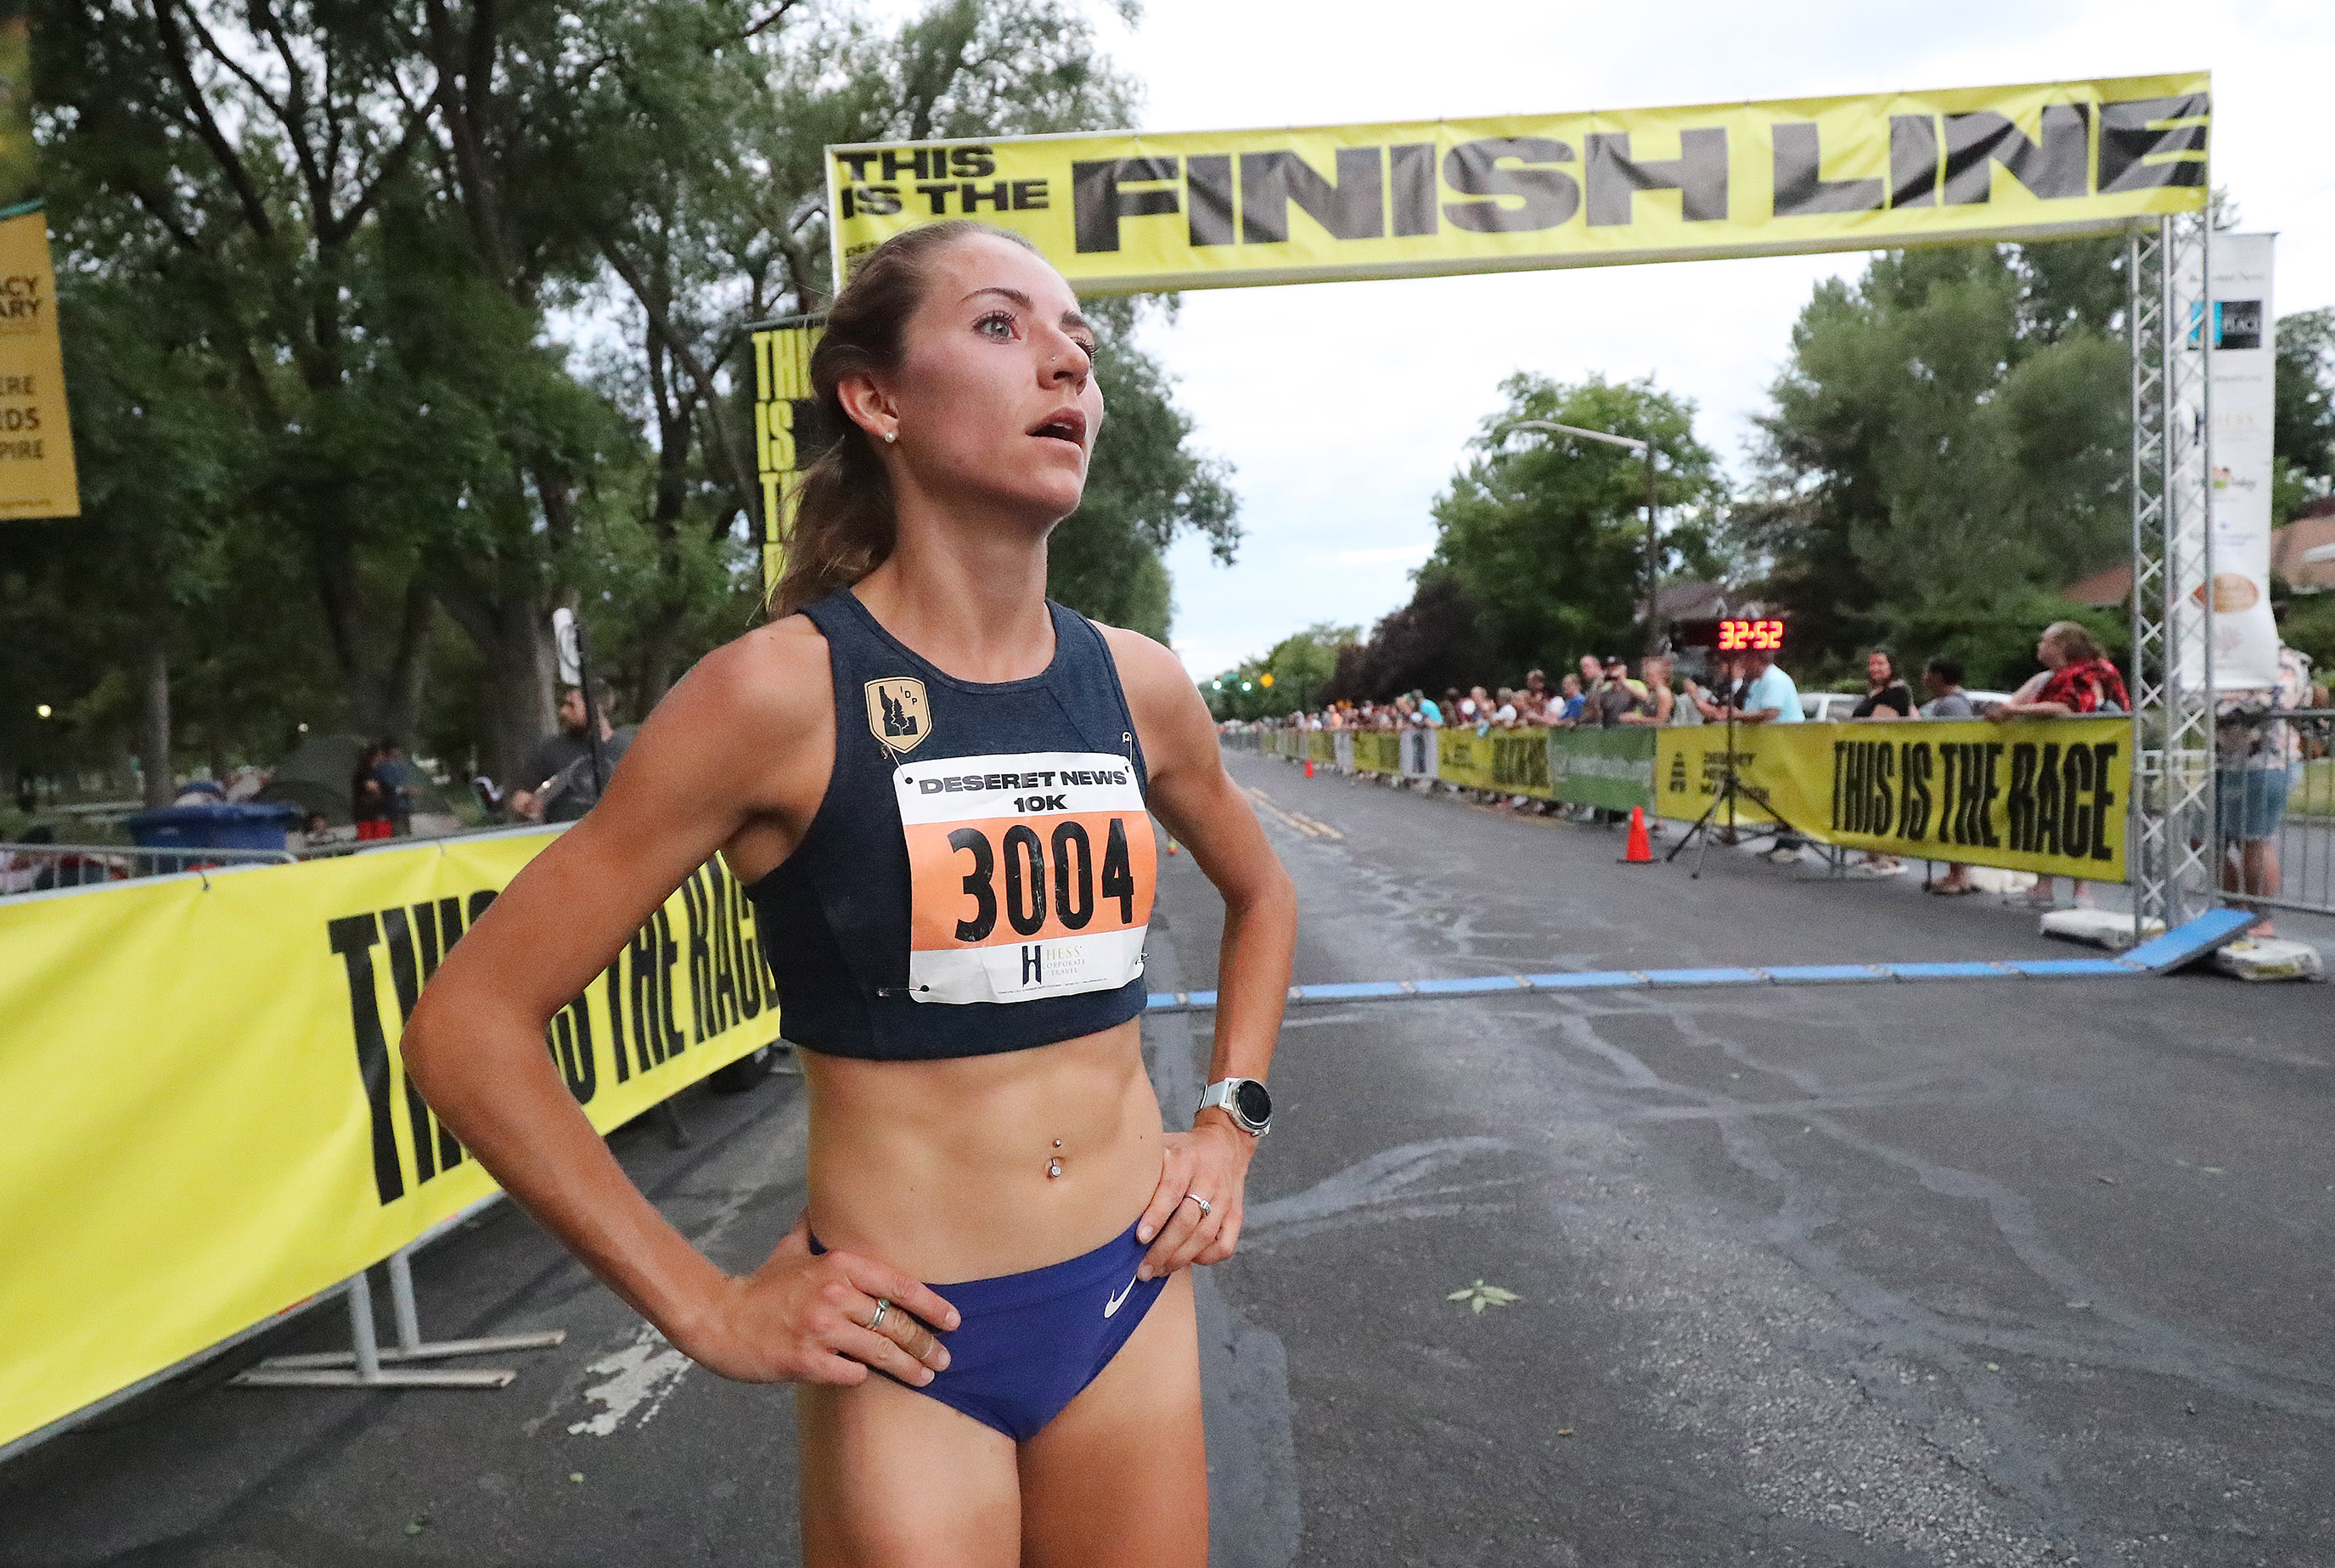 Grayson Murphy wins the women's Deseret News 10K in Salt Lake City on Wednesday, July 24, 2019.